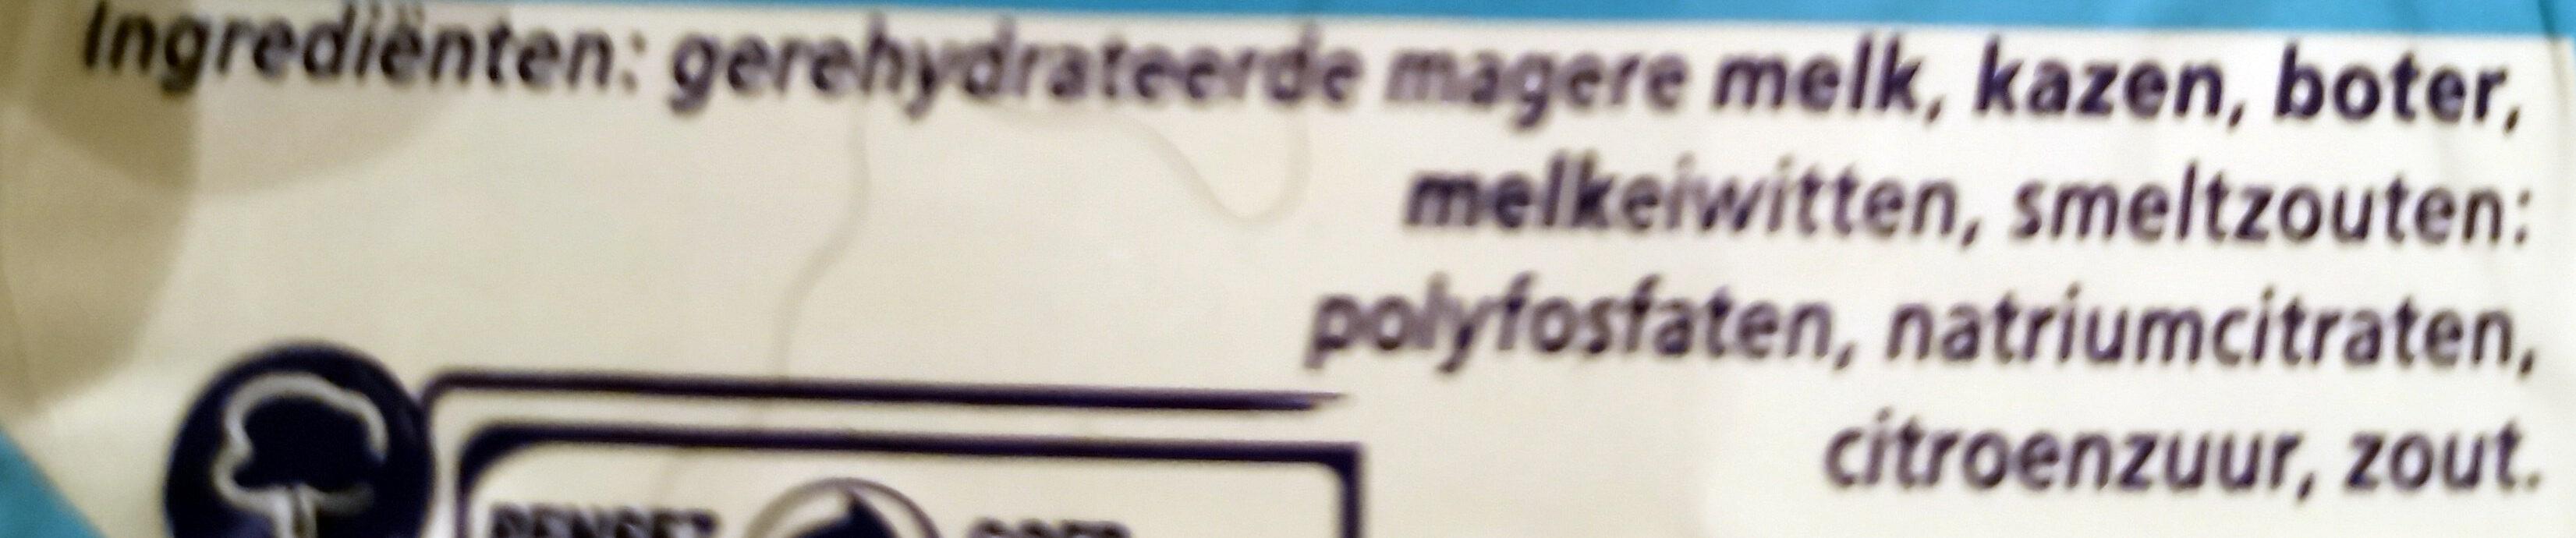 Apericube Nature - Ingrediënten - nl